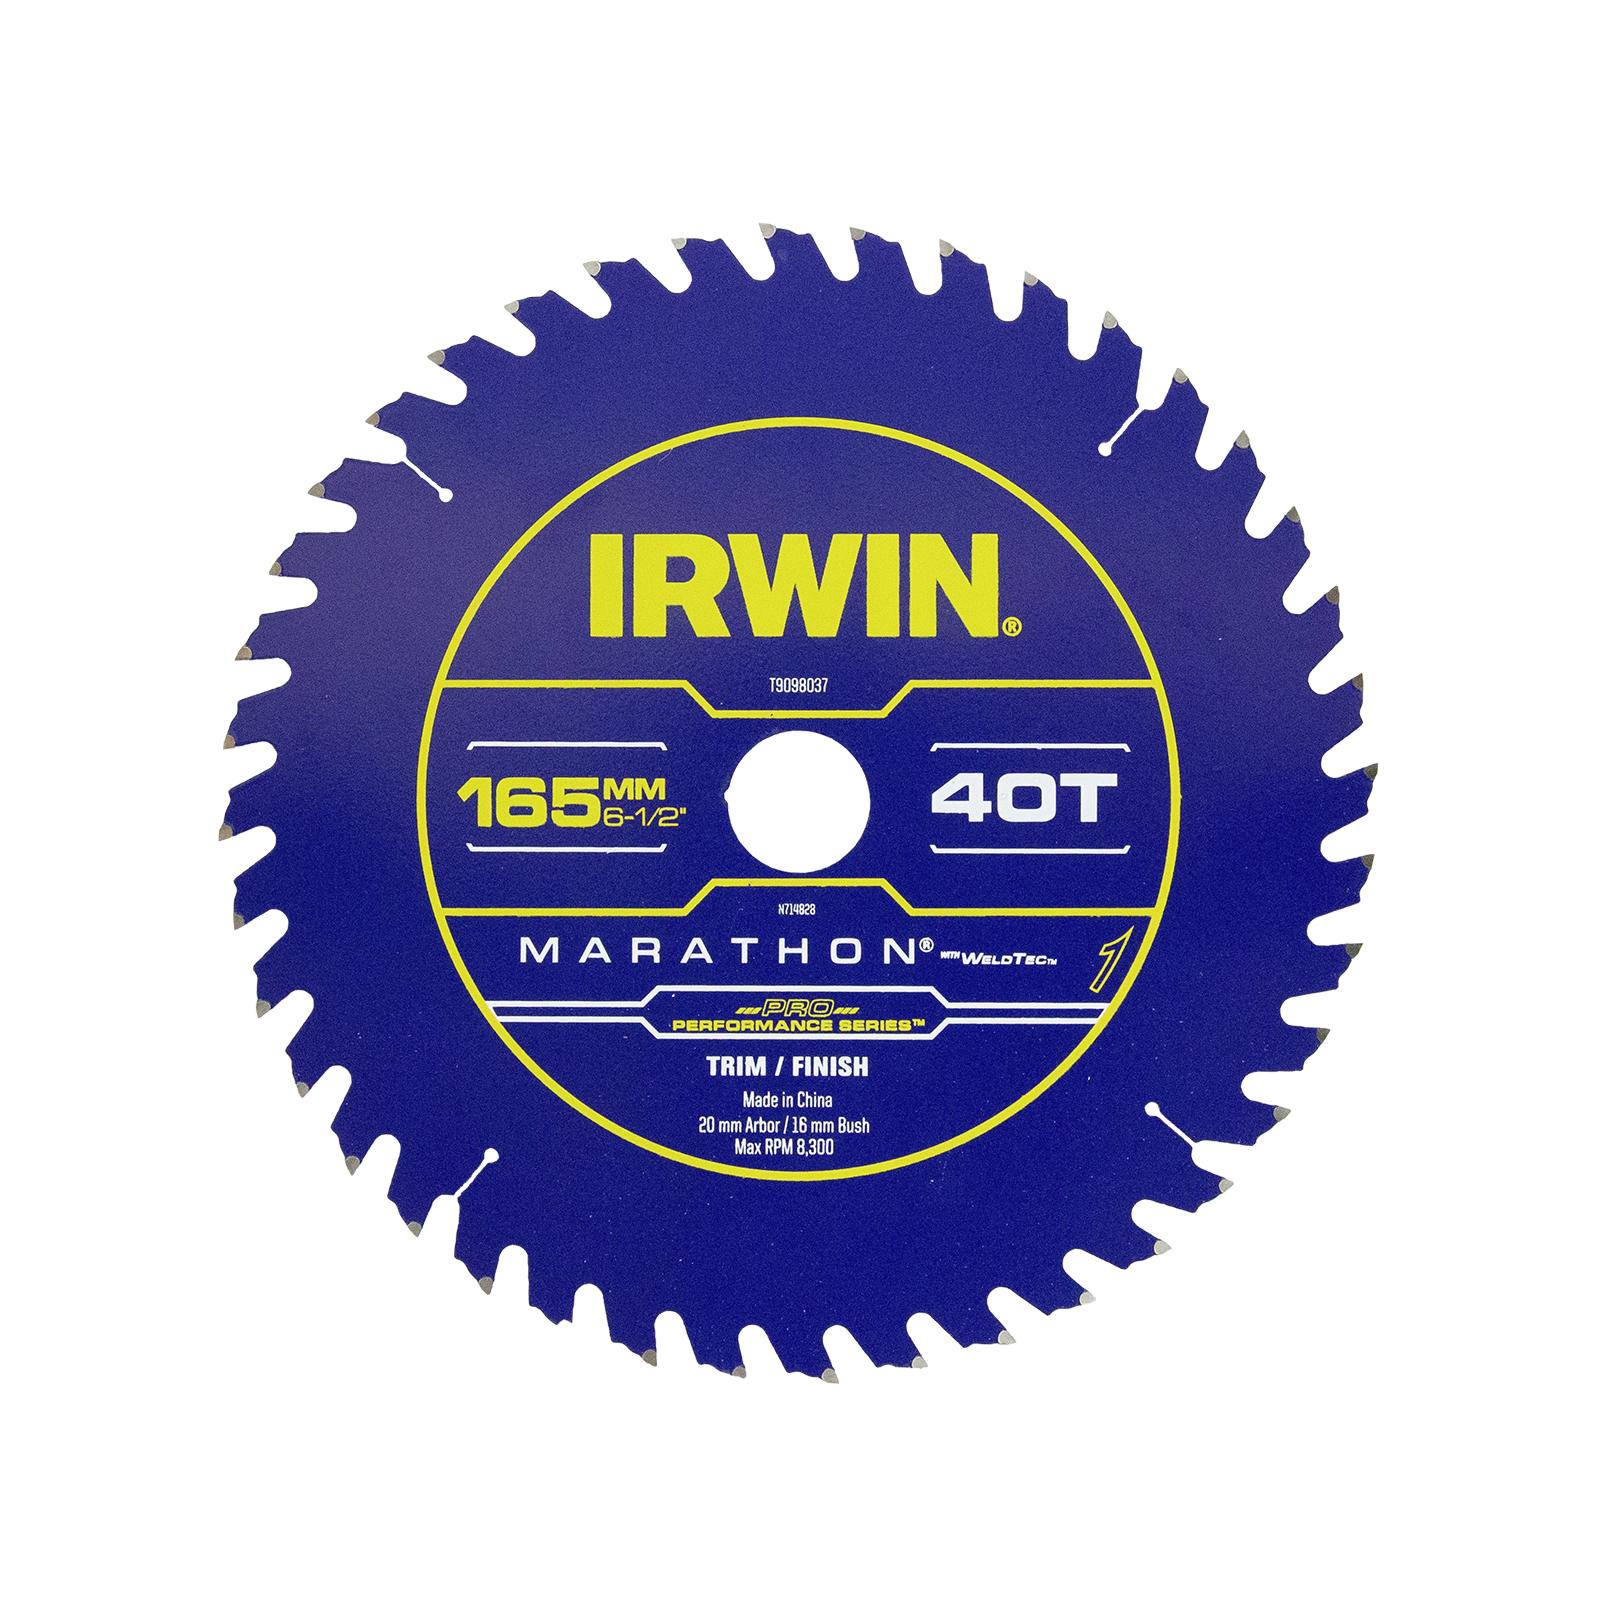 Irwin WeldTec 165mm 40T Construction Circular Saw Blade